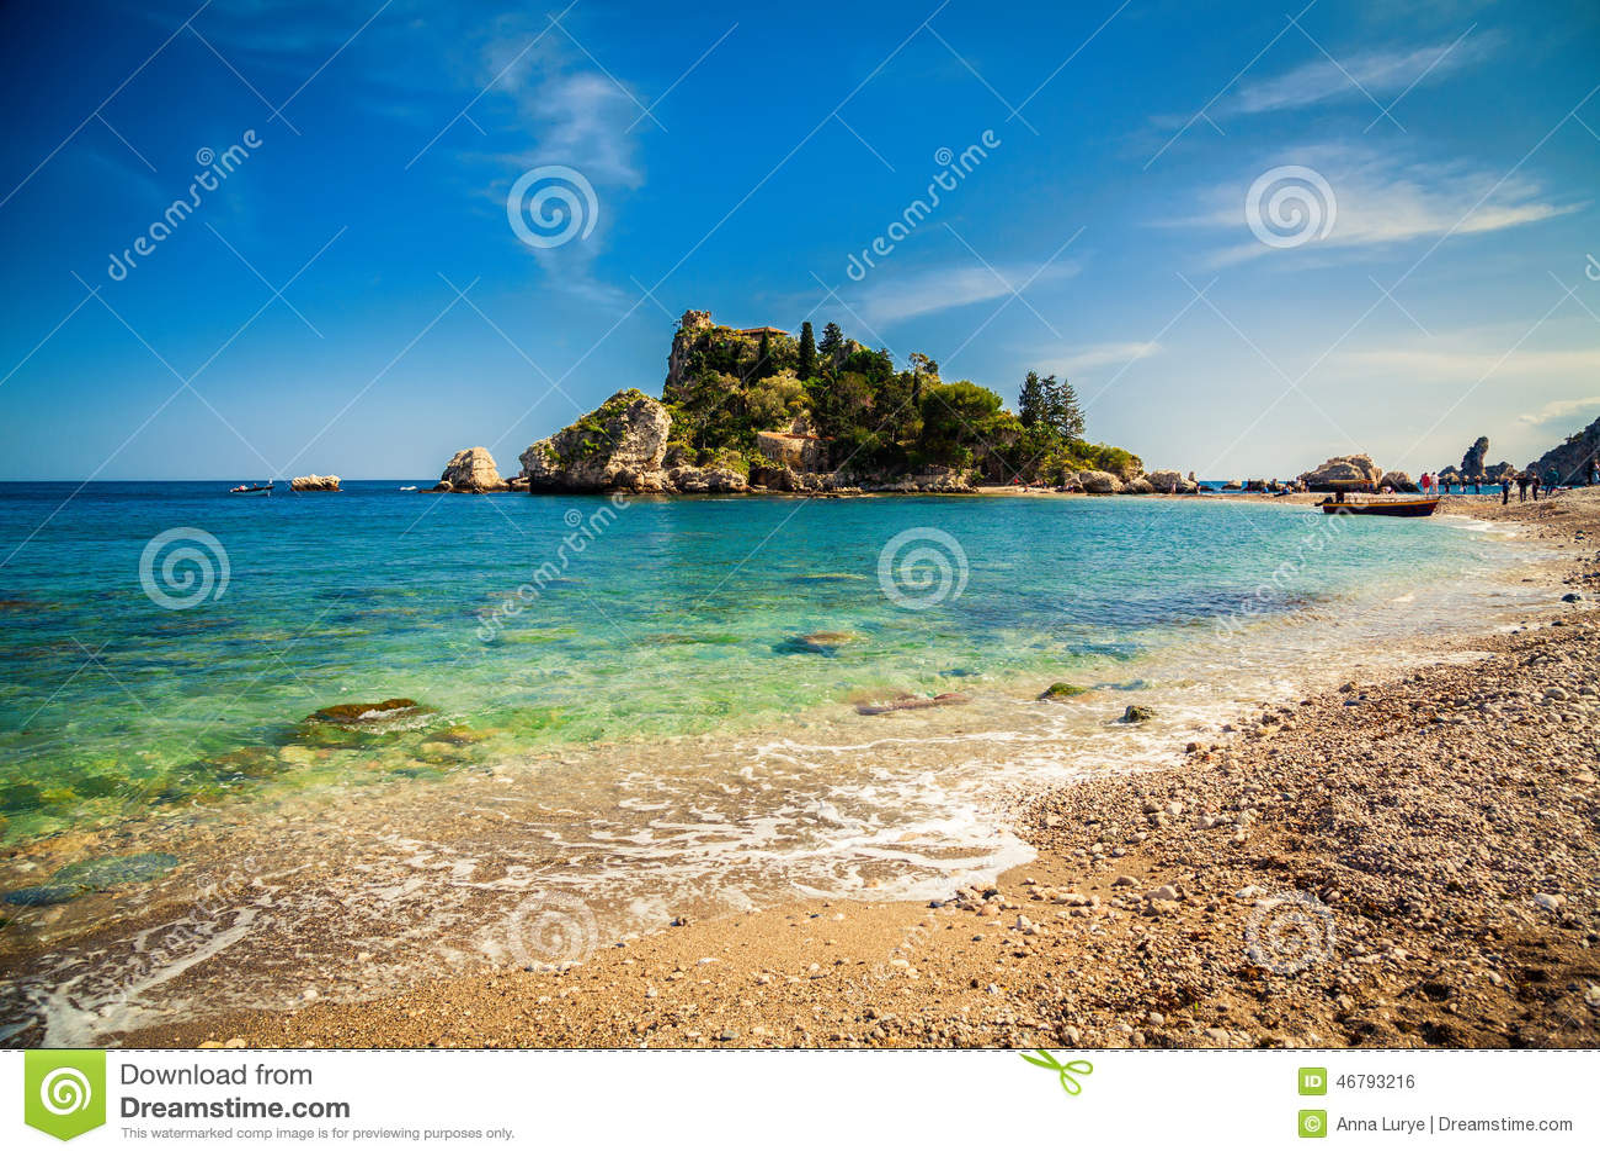 Pebble Beach Isola Bella in Taormina